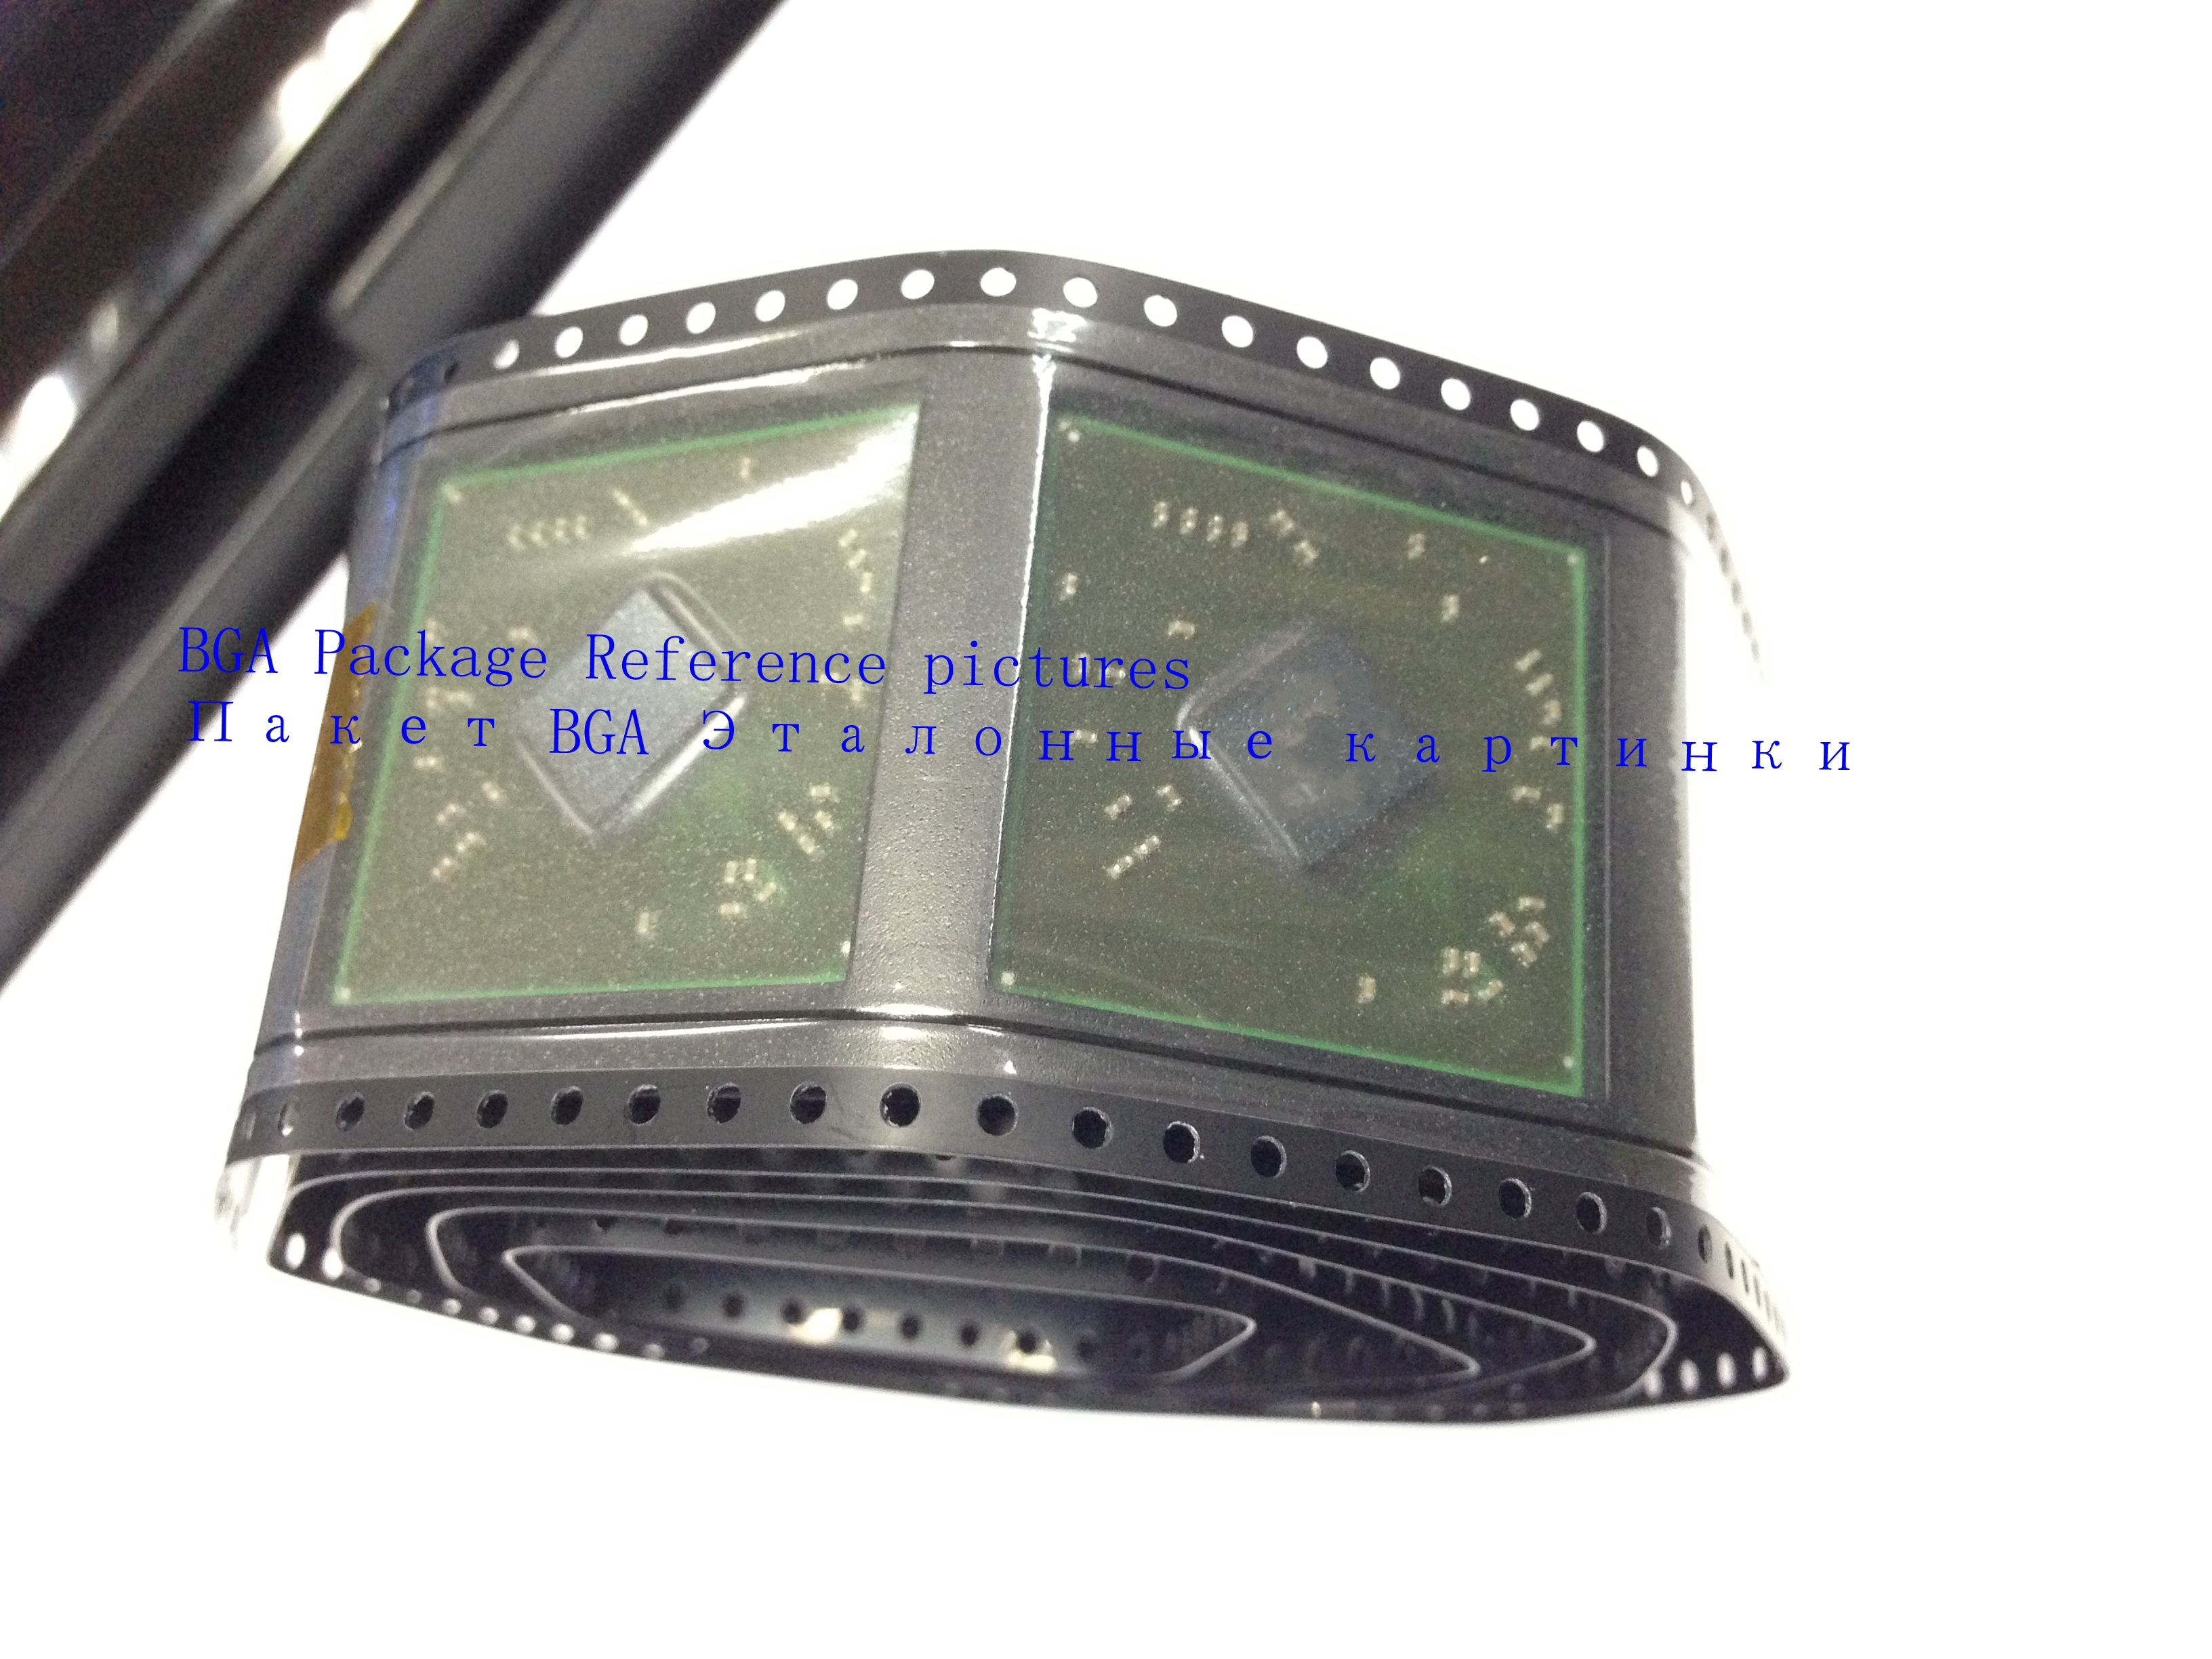 1pcs/lot 100% Original G92-700-A2 BGA chip G92 700 A2 DC201203+lead-free1pcs/lot 100% Original G92-700-A2 BGA chip G92 700 A2 DC201203+lead-free